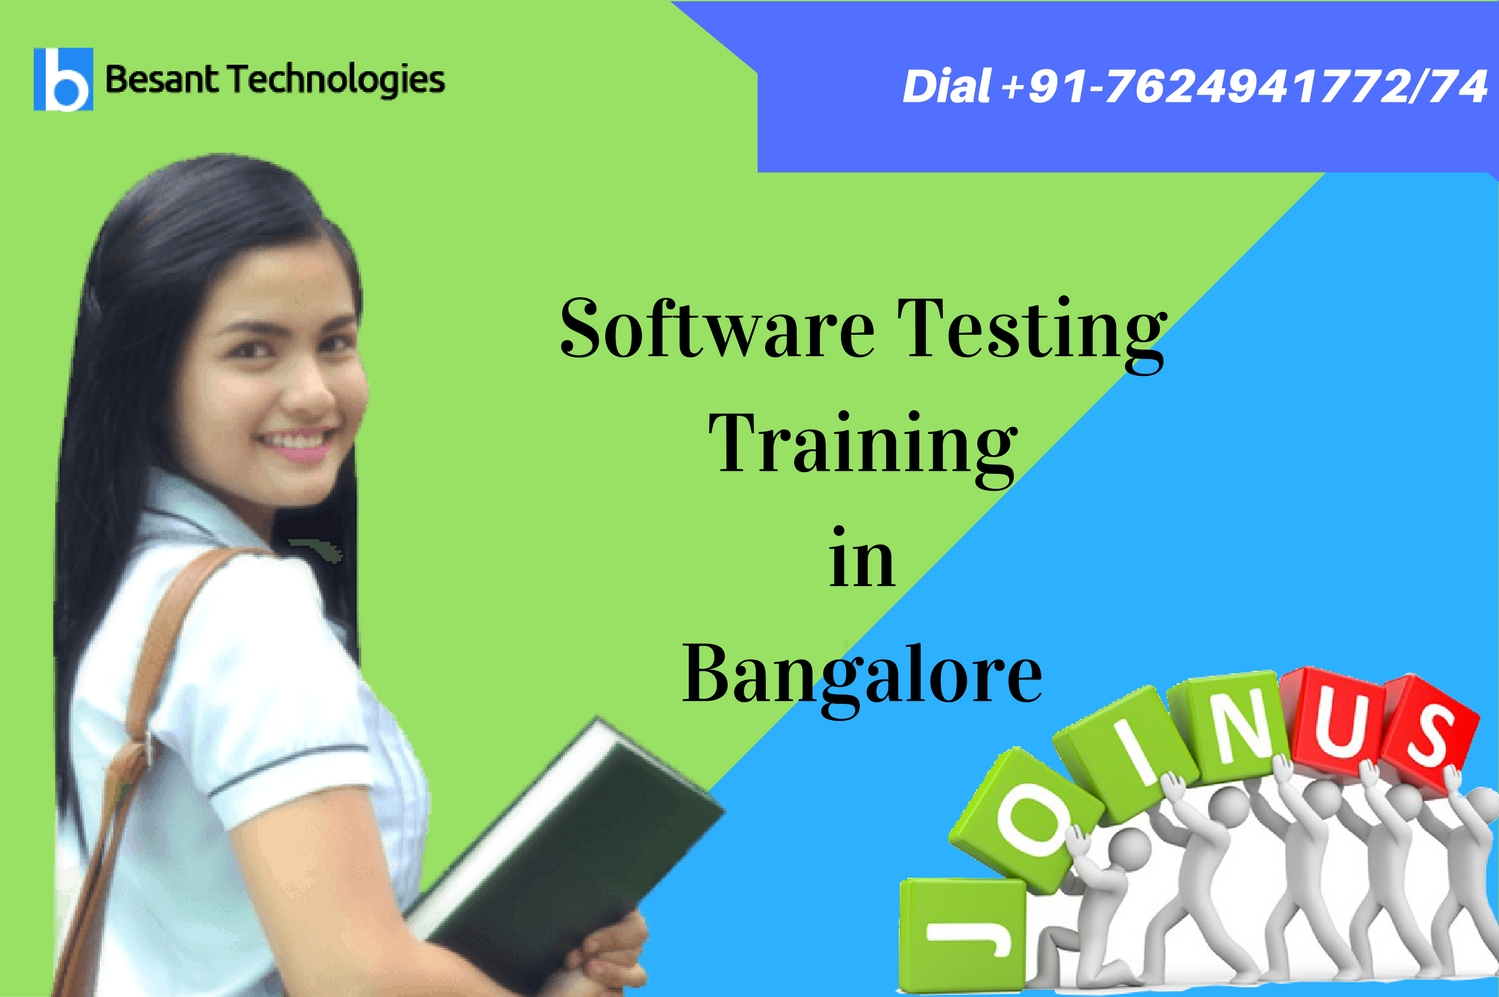 software testing tutorials in bangalore dating